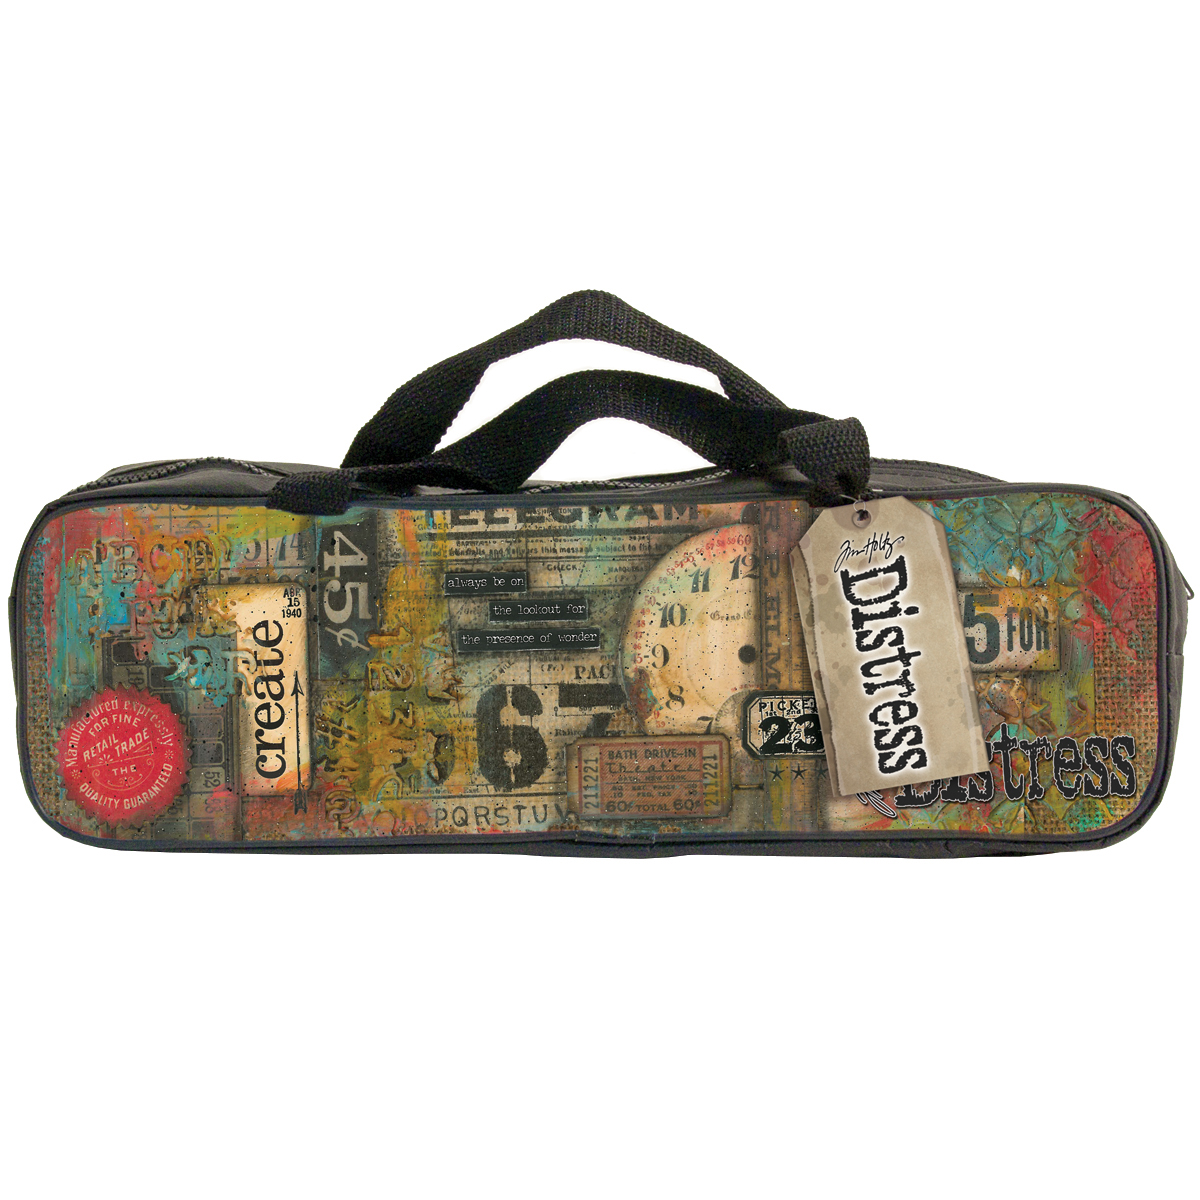 Accessory Bag Tim Holtz